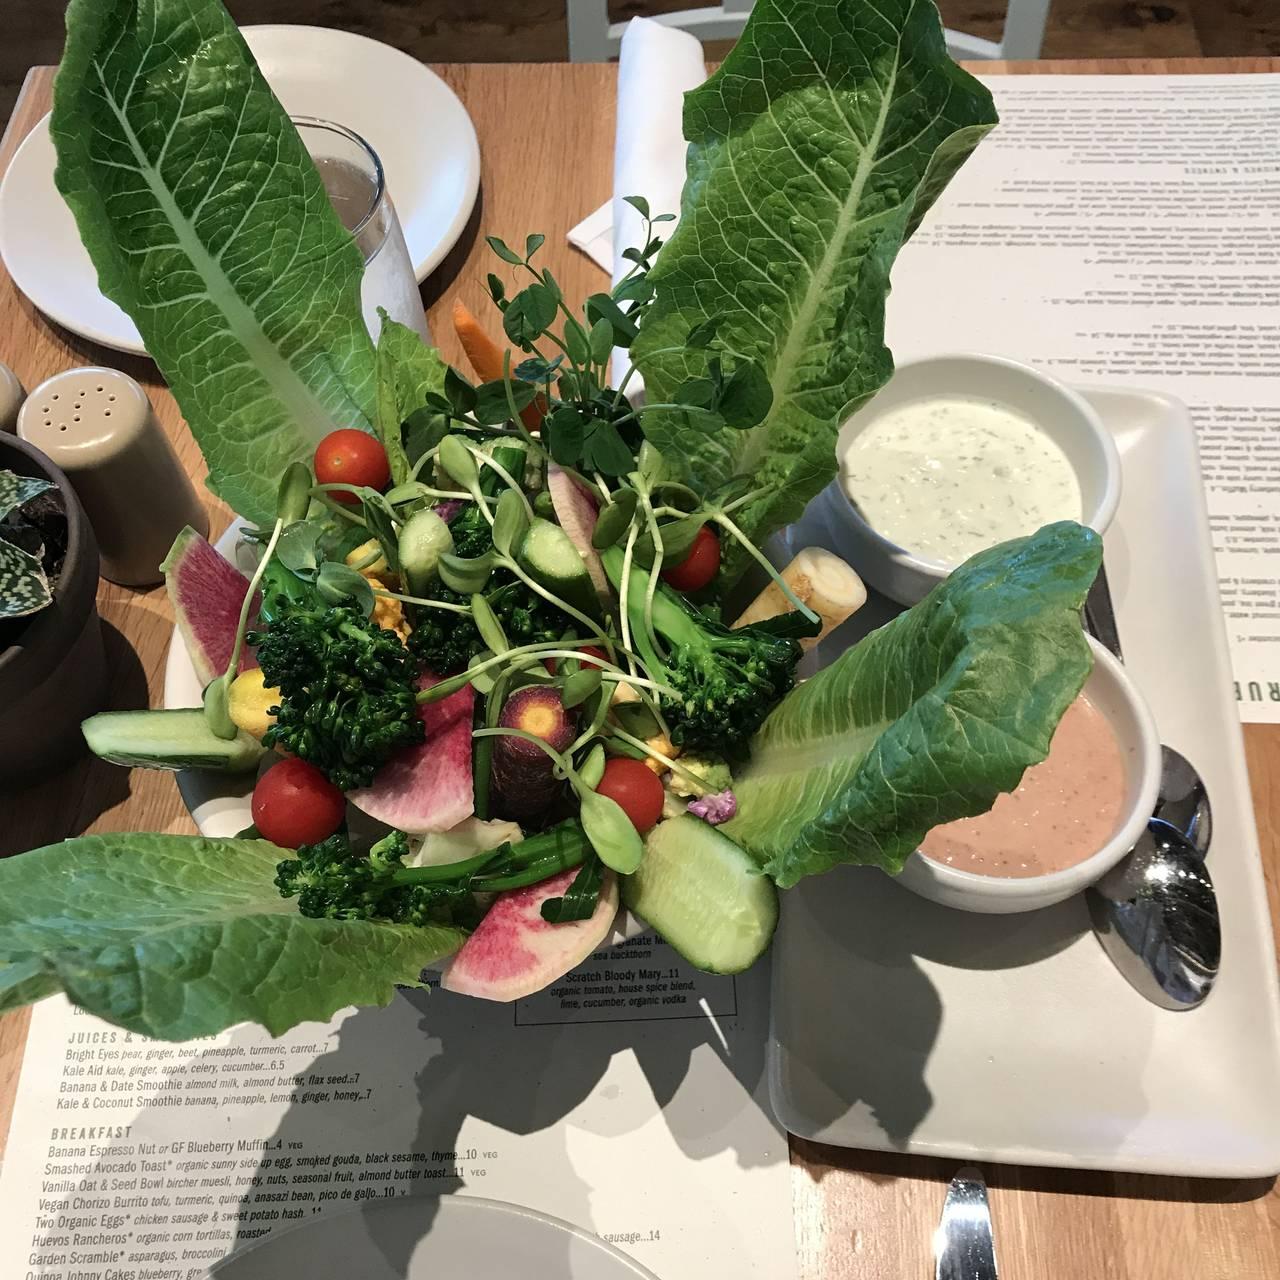 True Food Kitchen Austin Restaurant Tx Opentable Picco Latte Matcha Green Tea Can